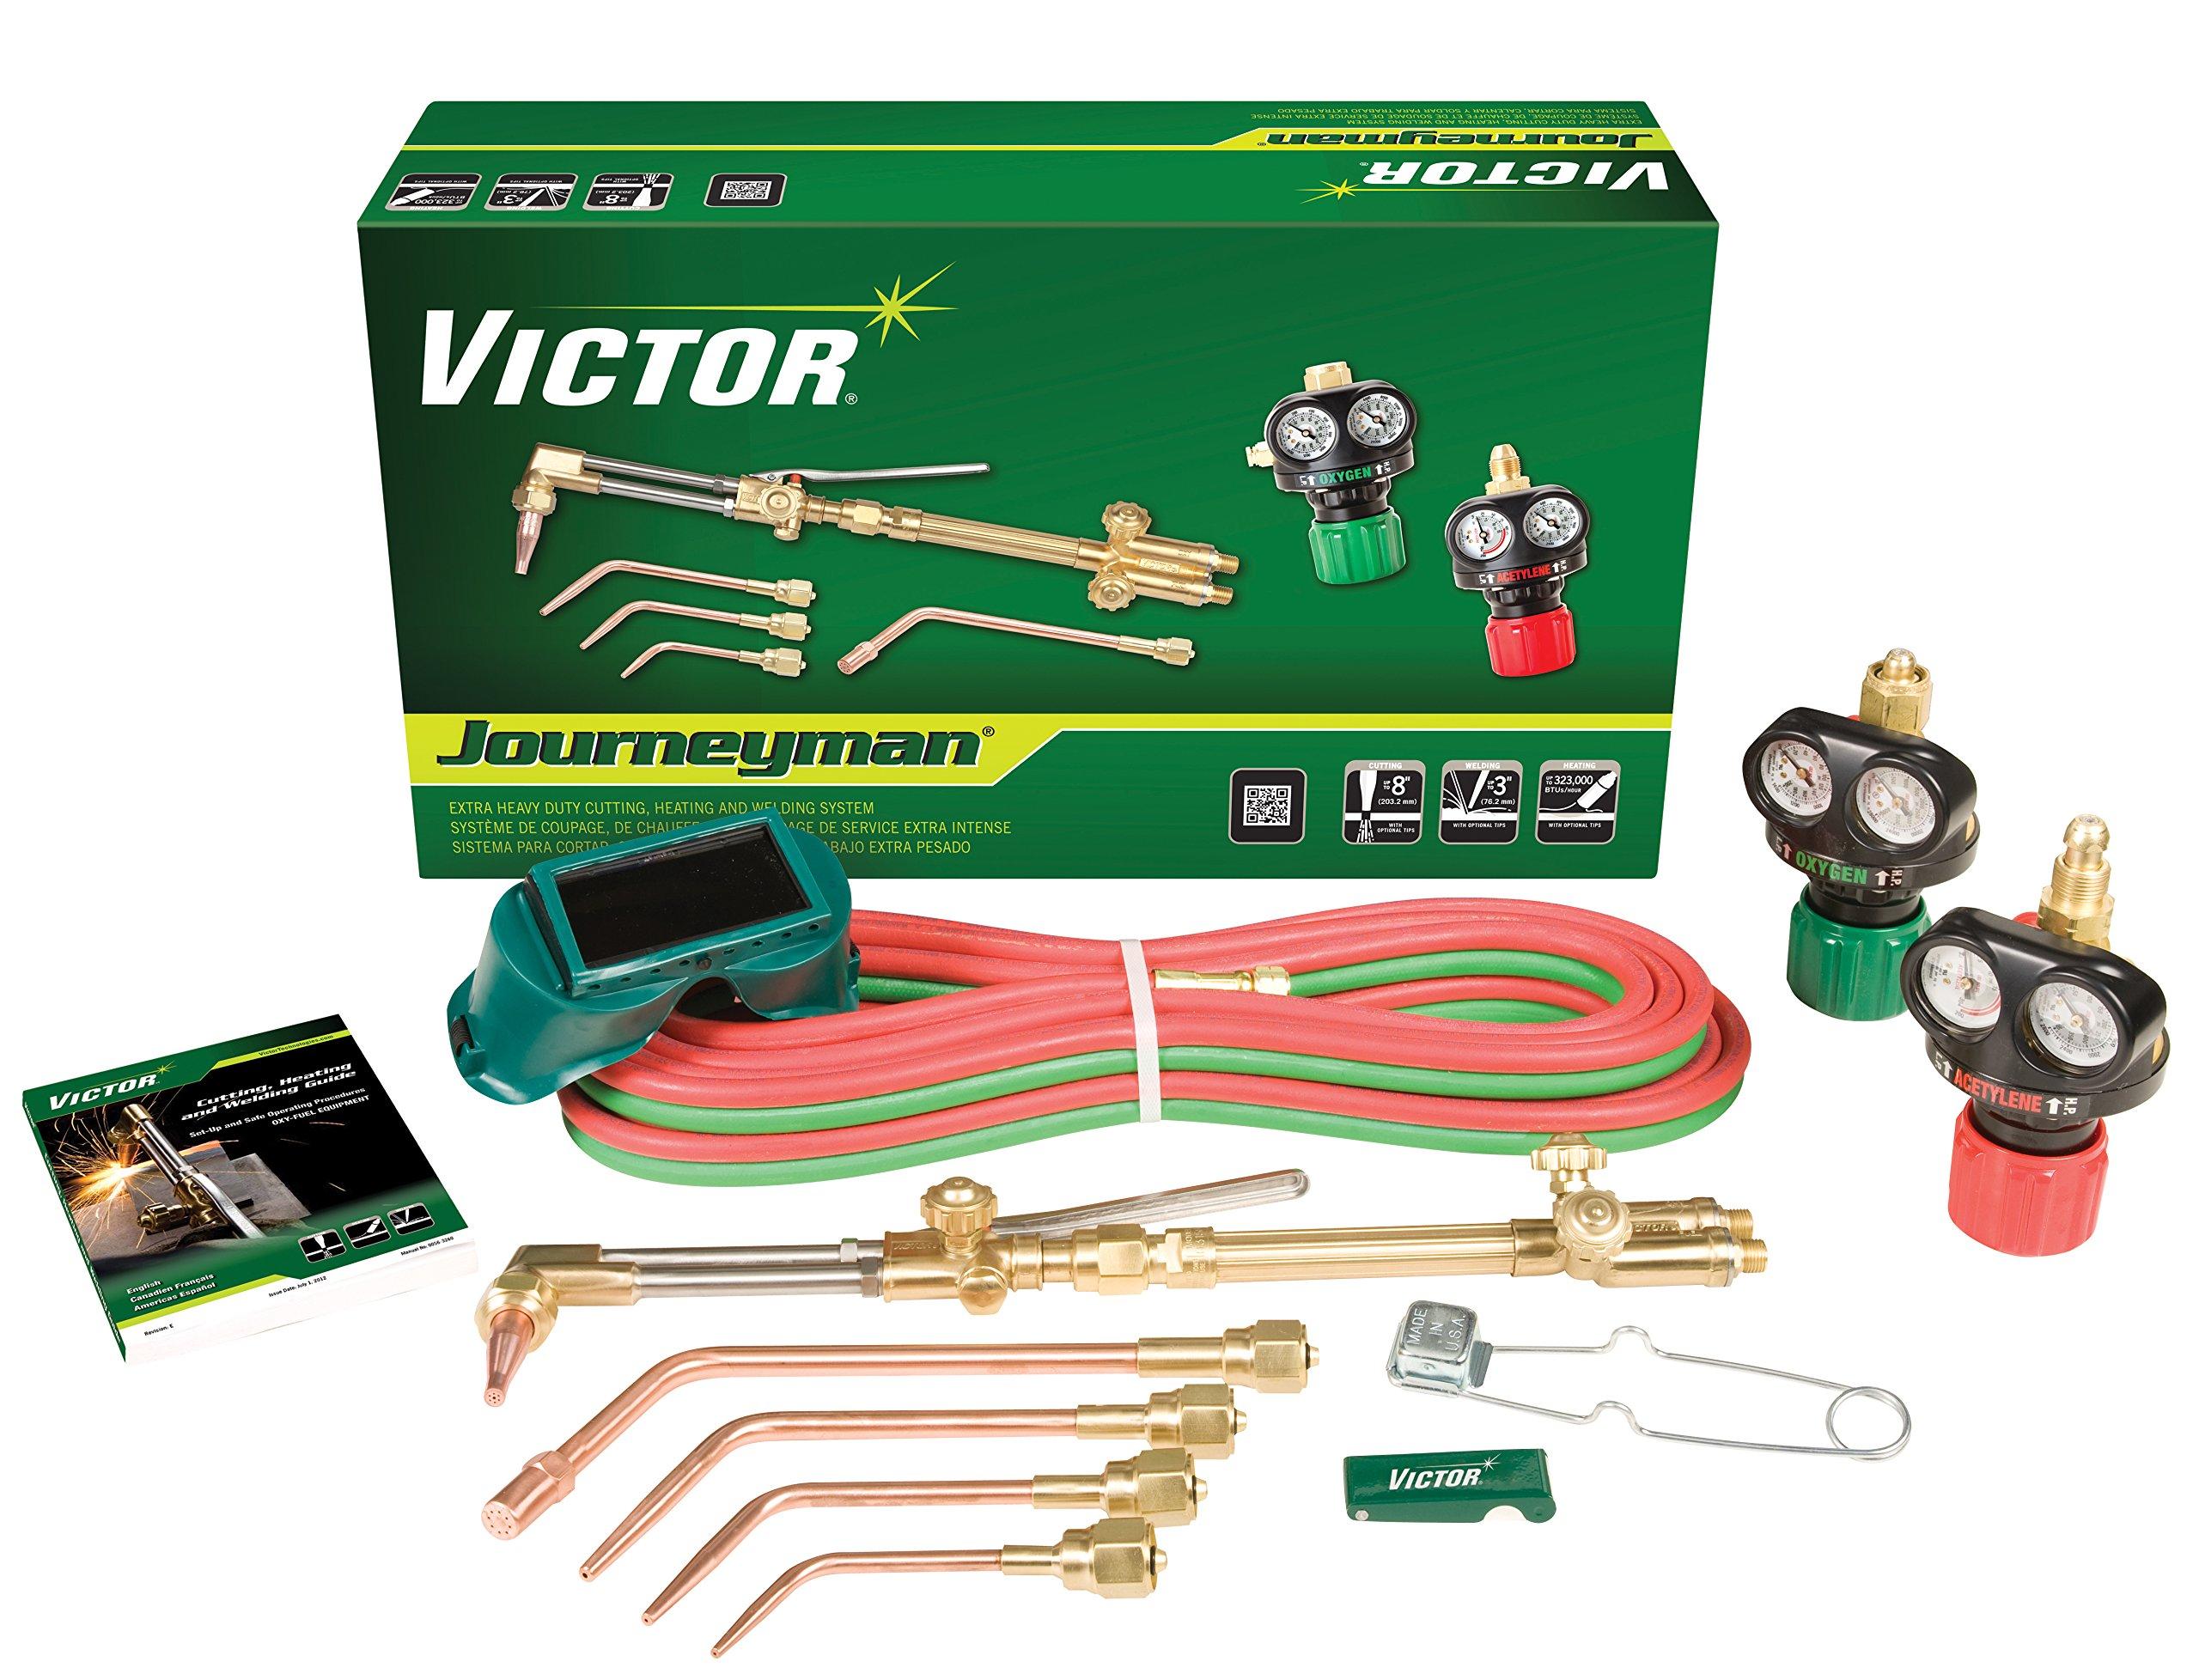 Victor 0384-2036 Journeyman Heavy Duty Cutting System, Acetylene Gas Service, ESS4-15-510 Fuel Gas Regulator